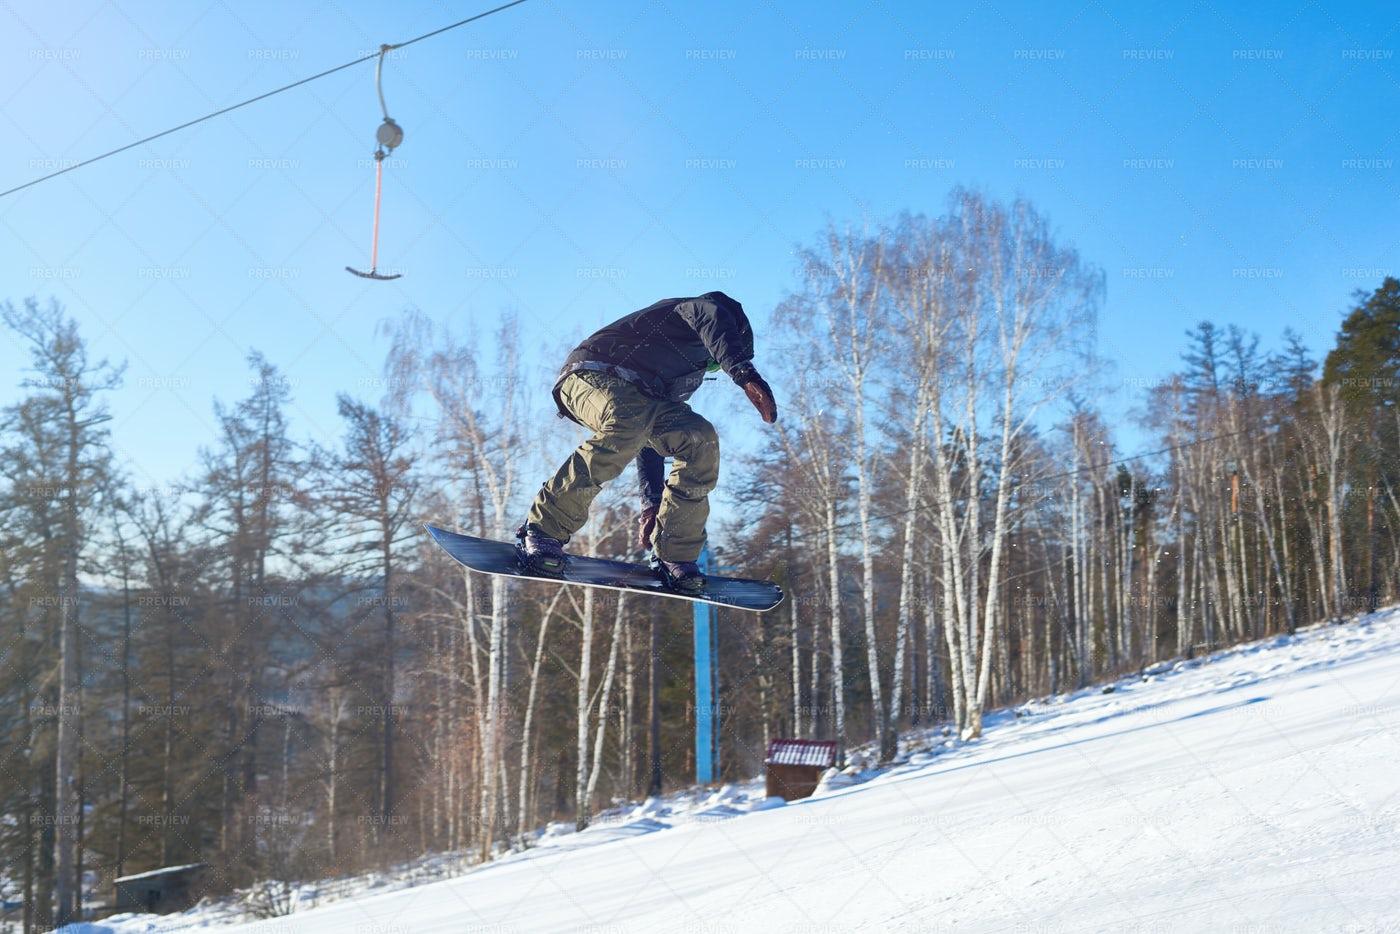 Extreme Snowboarding: Stock Photos